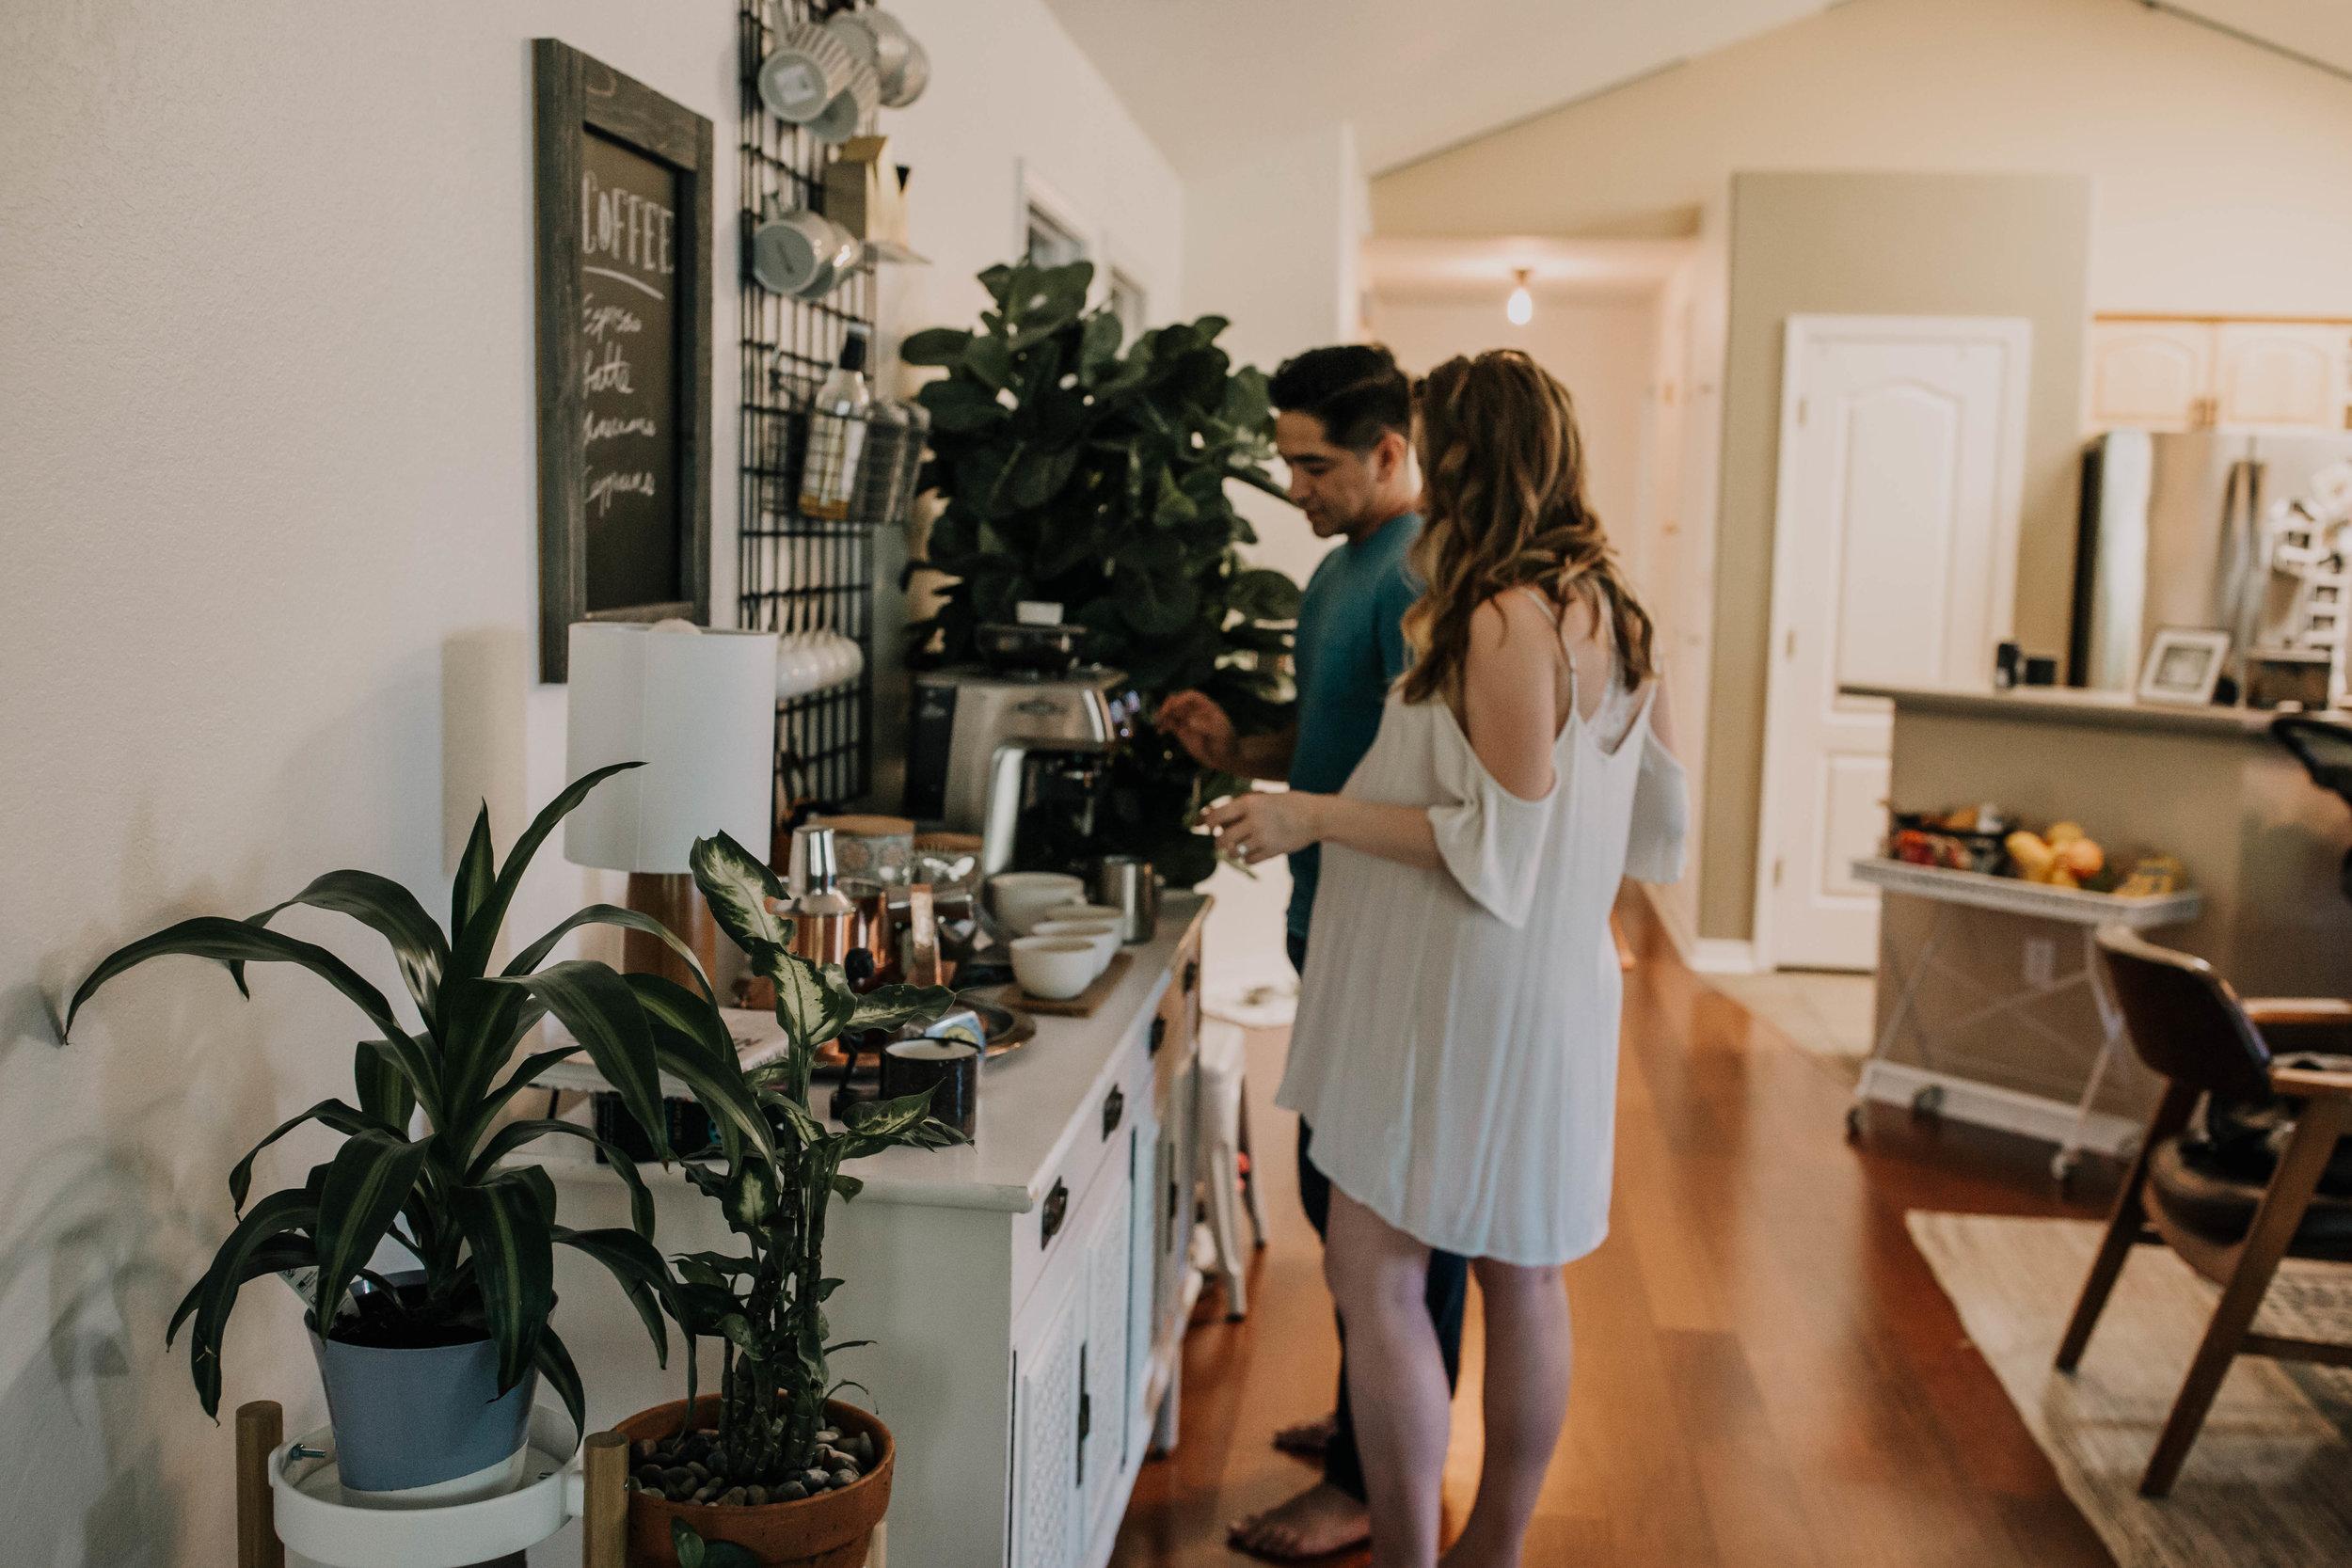 Boho home - life style maternity session